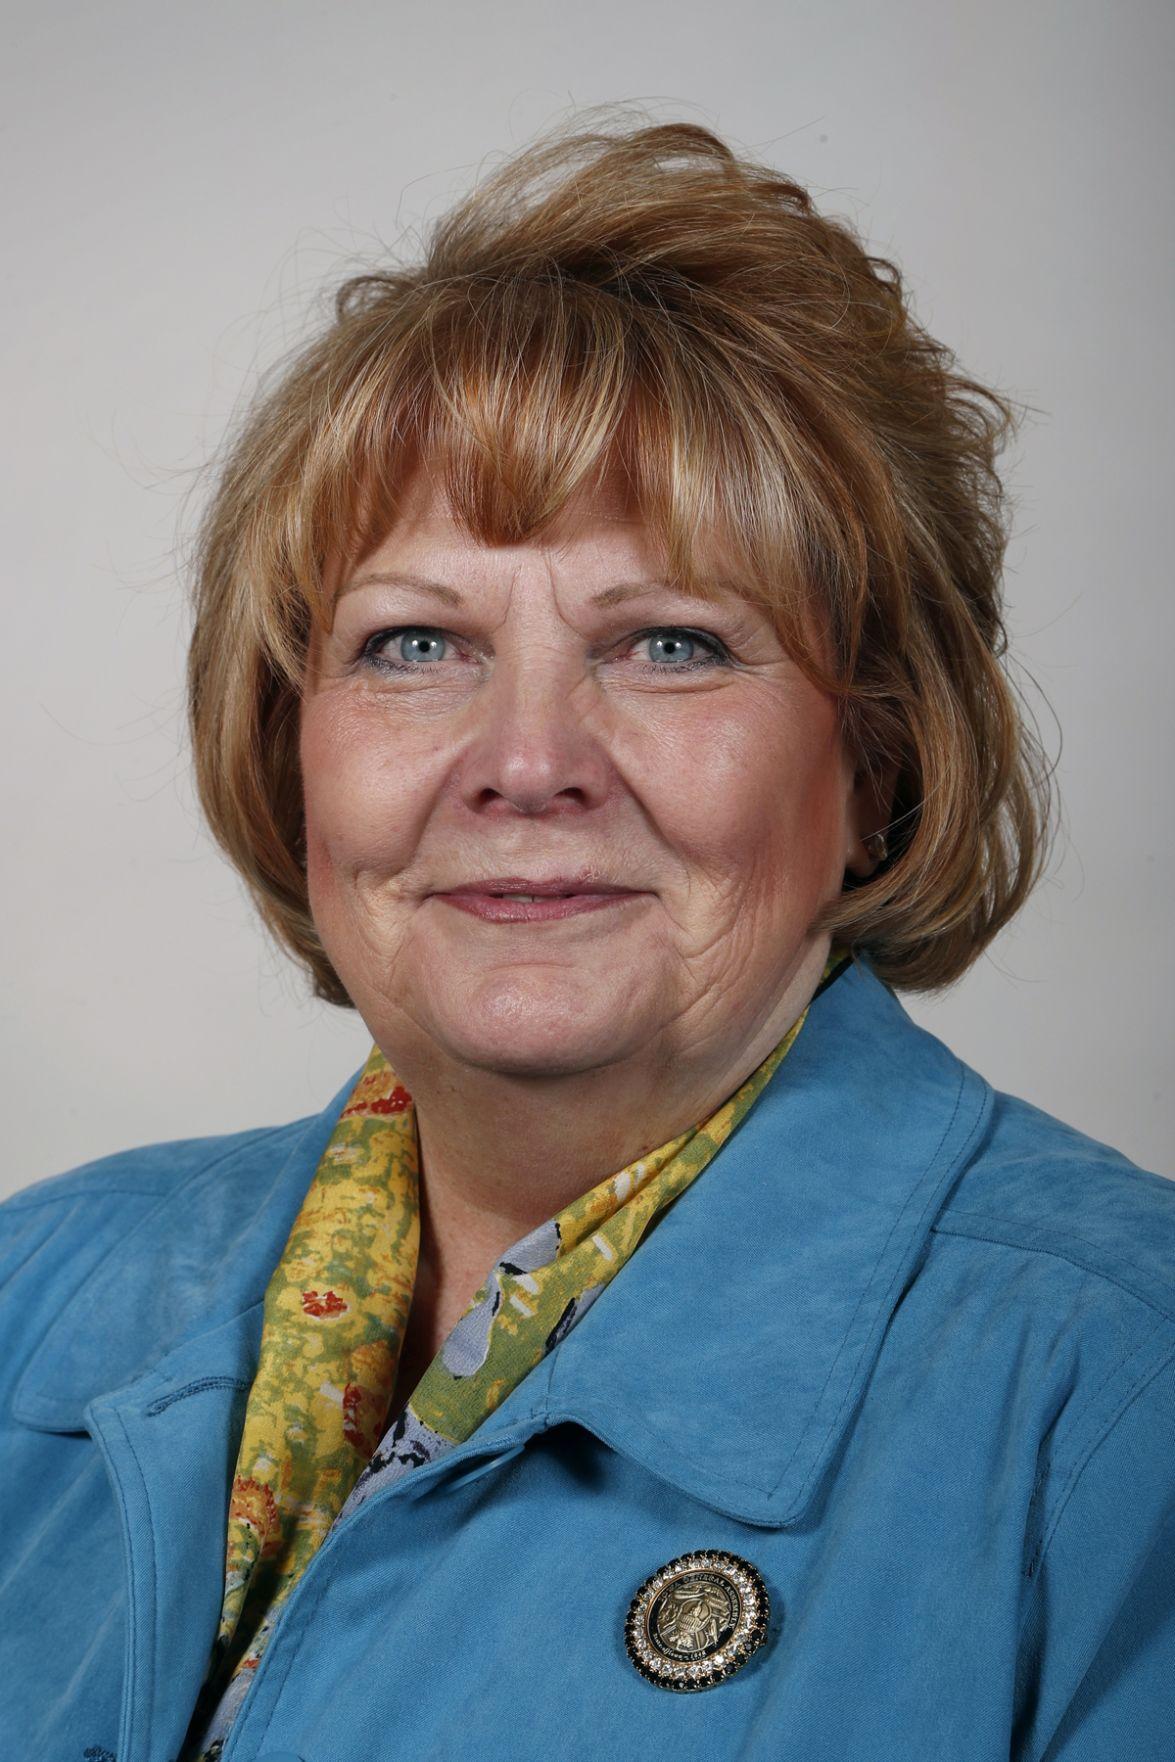 Iowa state Rep. Cindy Winckler